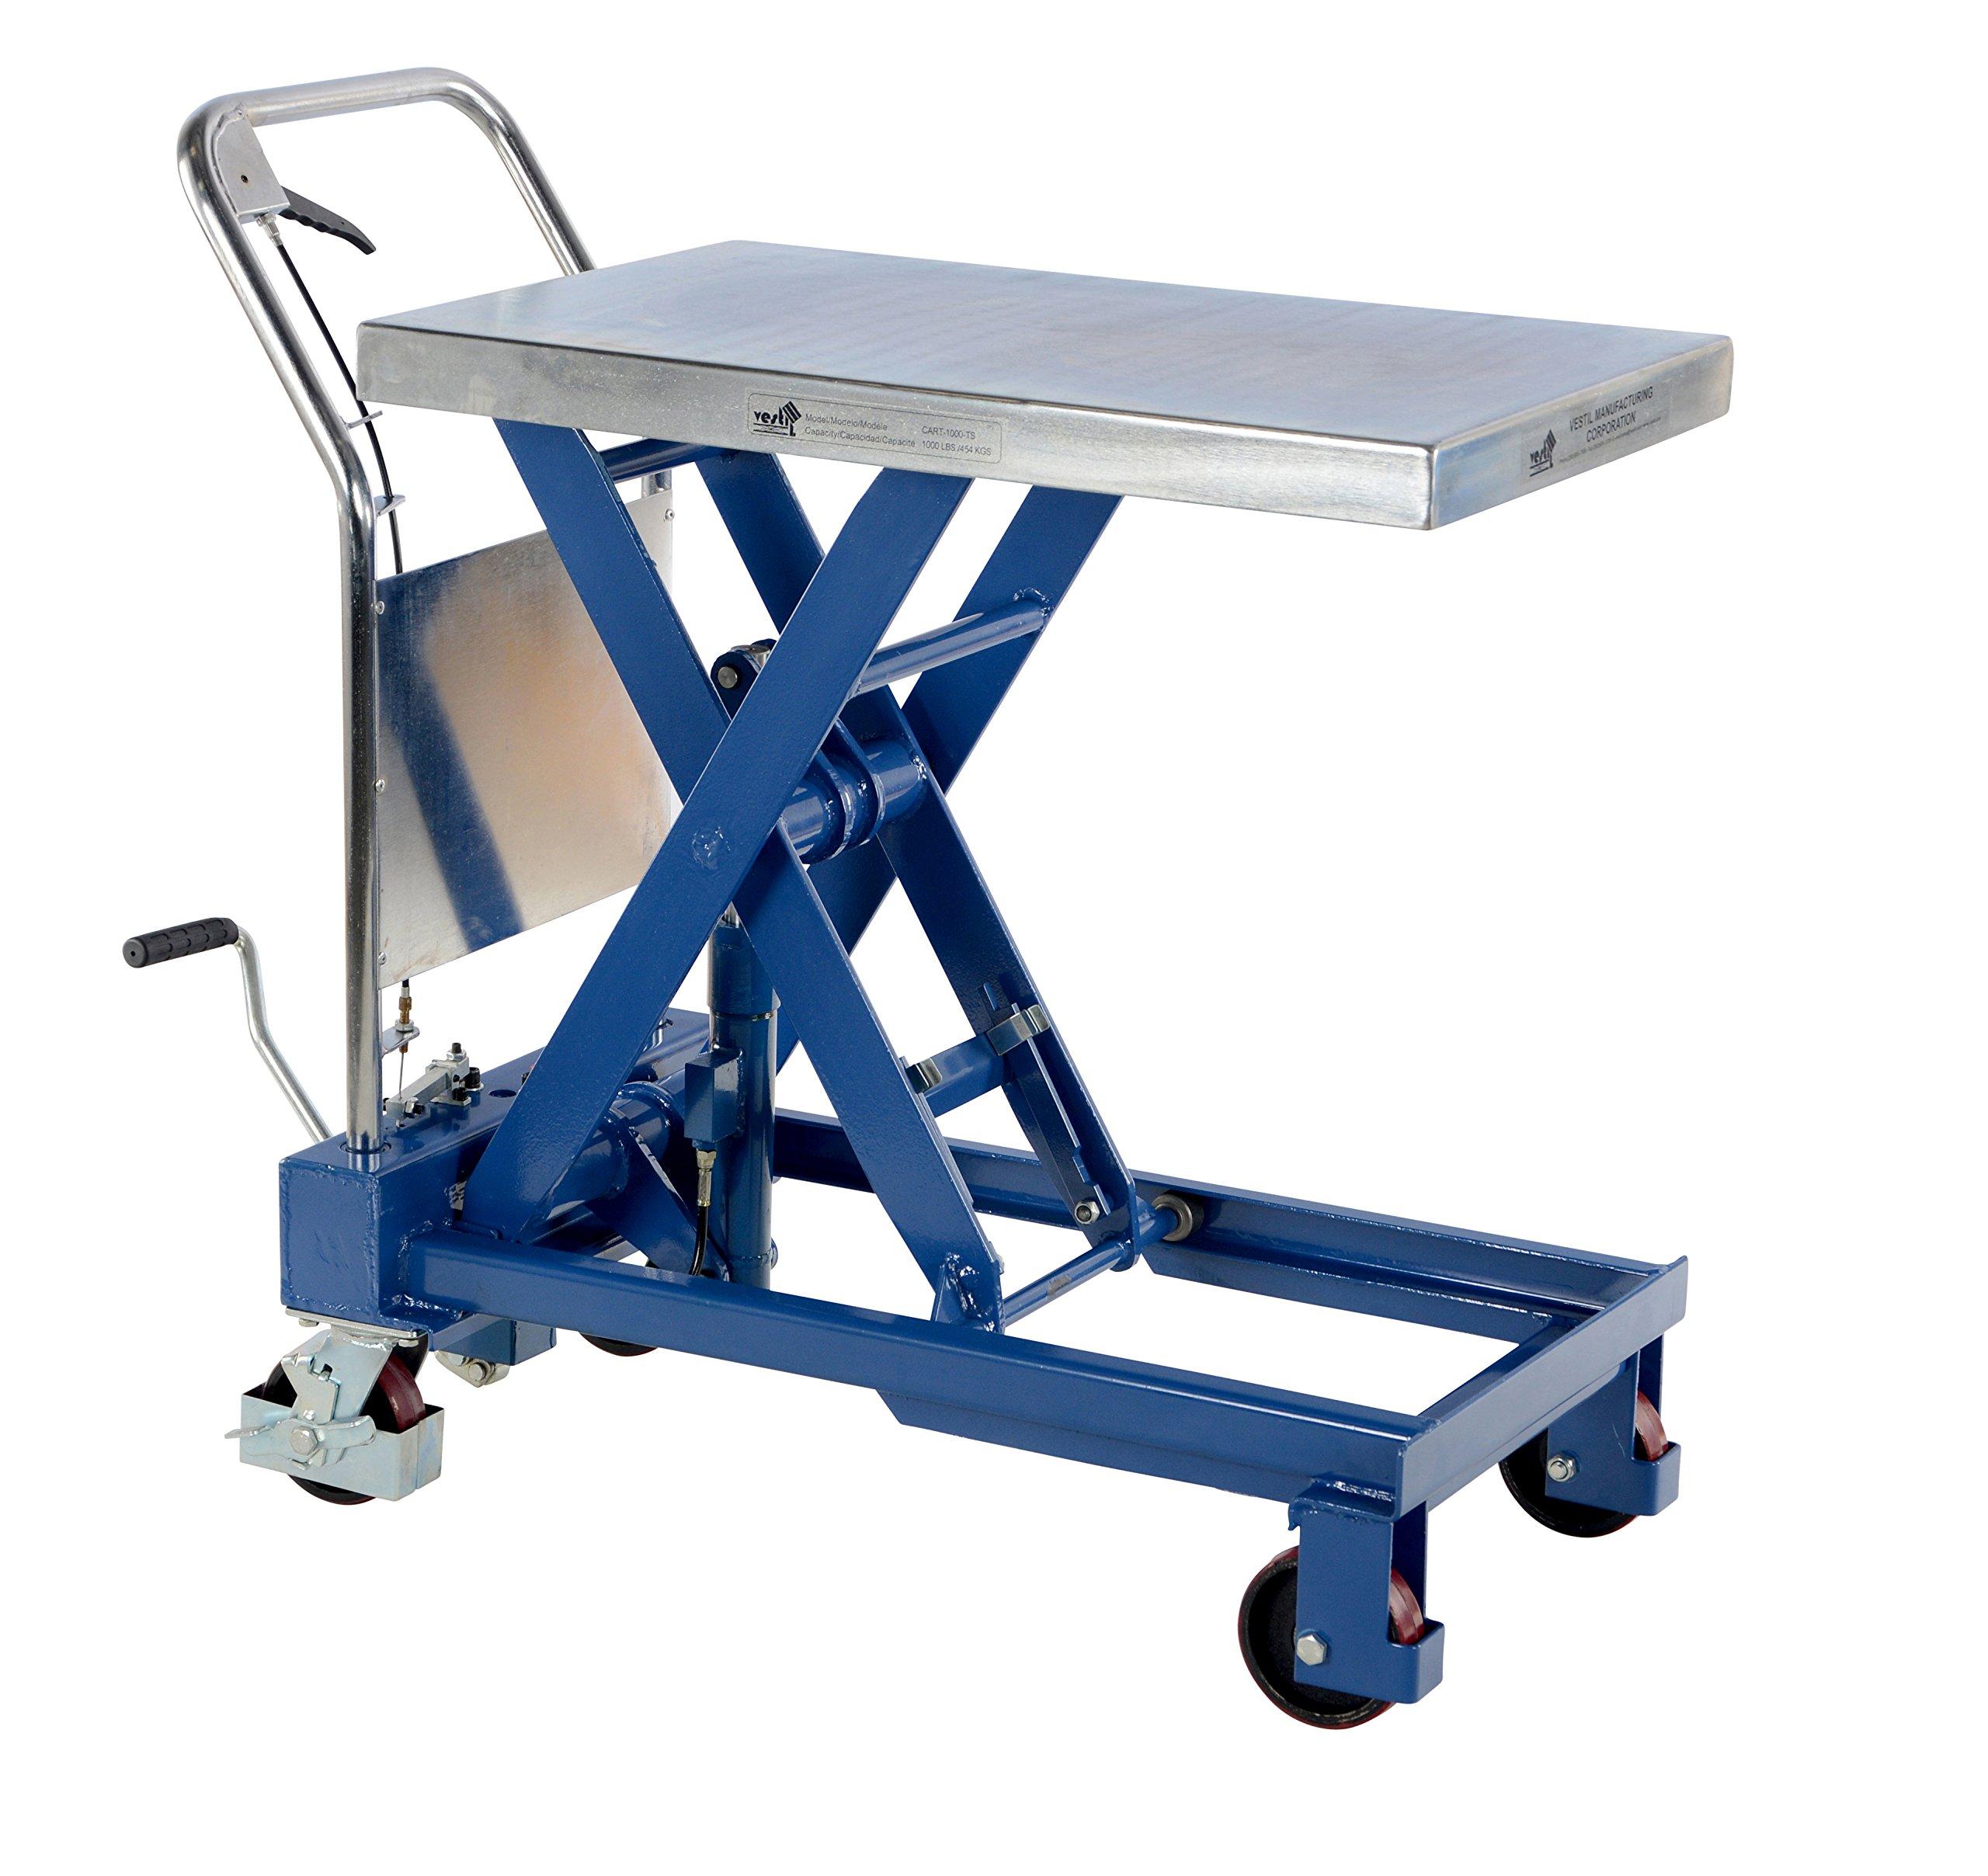 Vestil CART-1000-TS Hydraulic Elevating Cart, 1000 lbs Capacity, 32'' Length x 19-3/4'' Width Platform